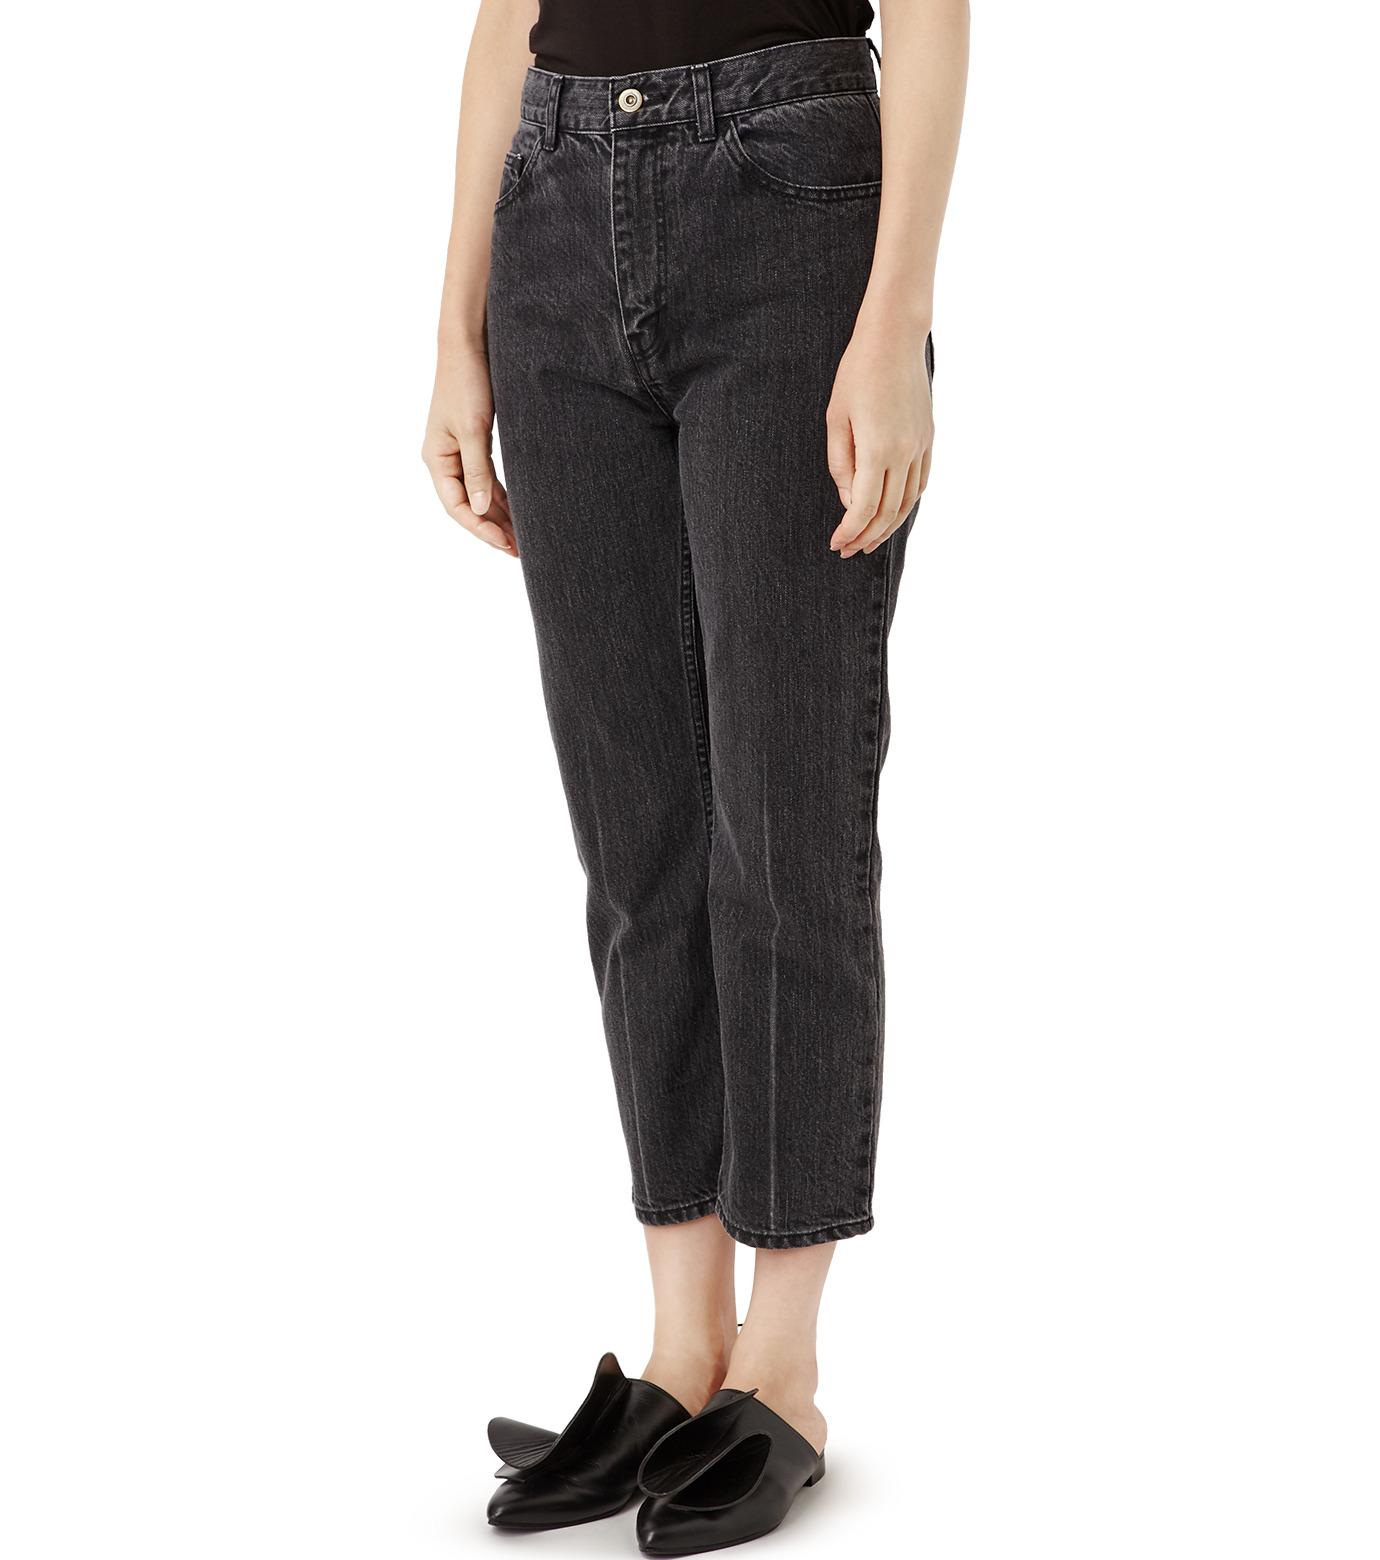 LE CIEL BLEU(ルシェルブルー)のセンタープレスデニムパンツ-BLACK(パンツ/pants)-18A68515 拡大詳細画像1